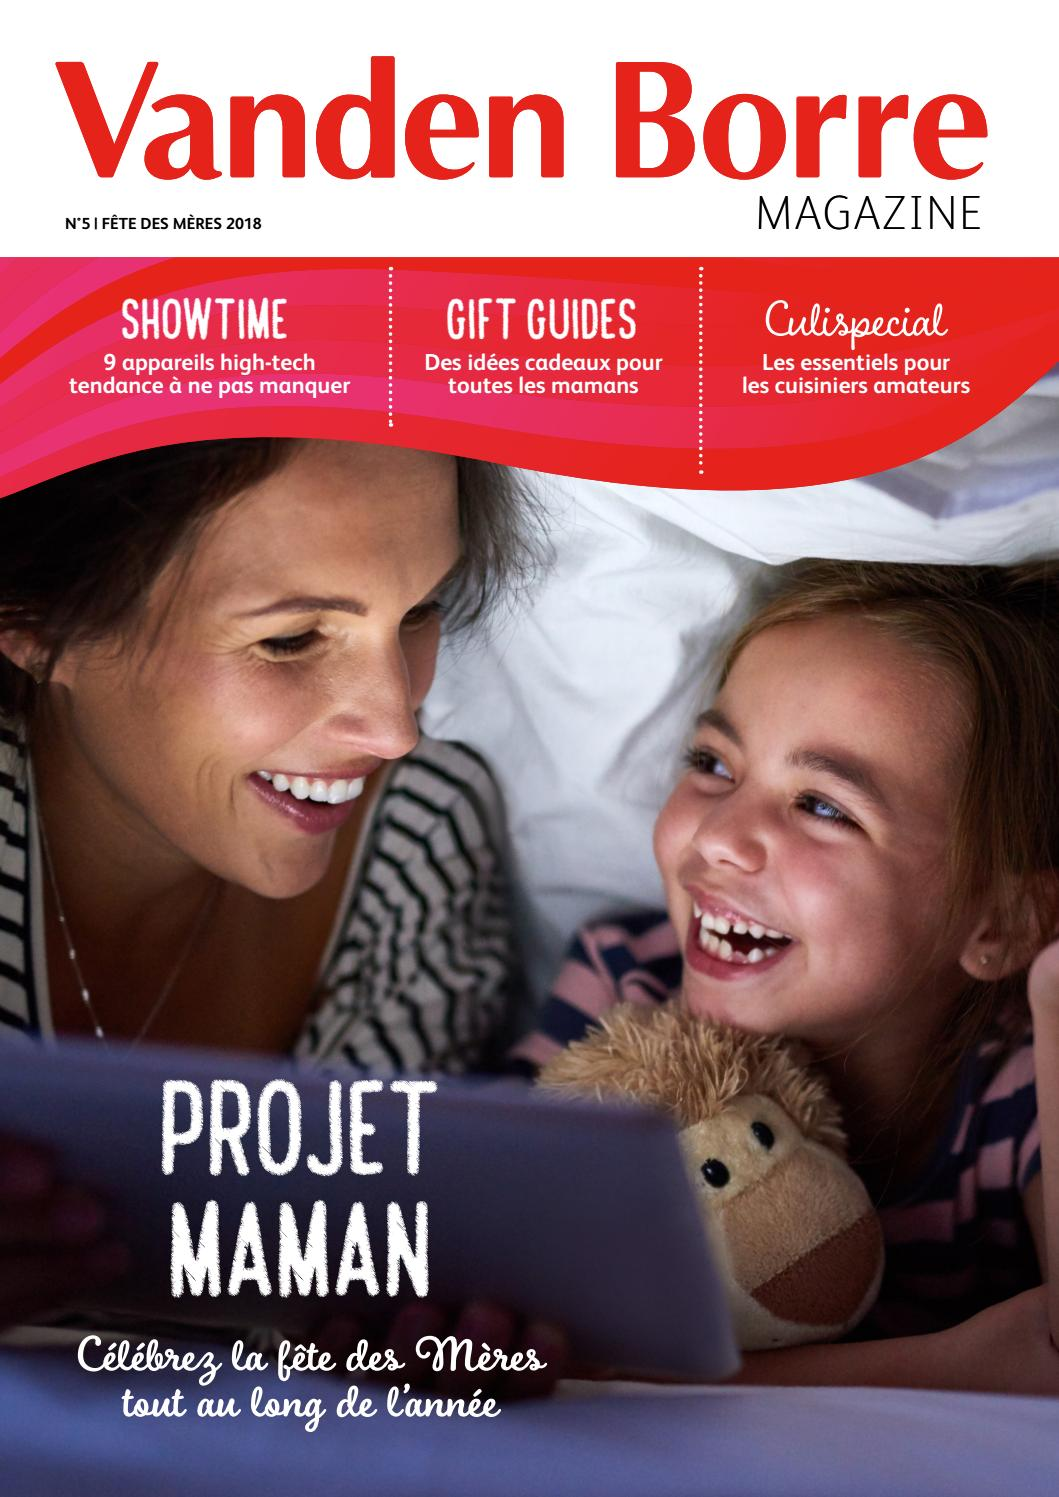 76d71469fa9793 Vanden Borre Magazine - Fête des Mères 2018 by Vanden Borre - issuu